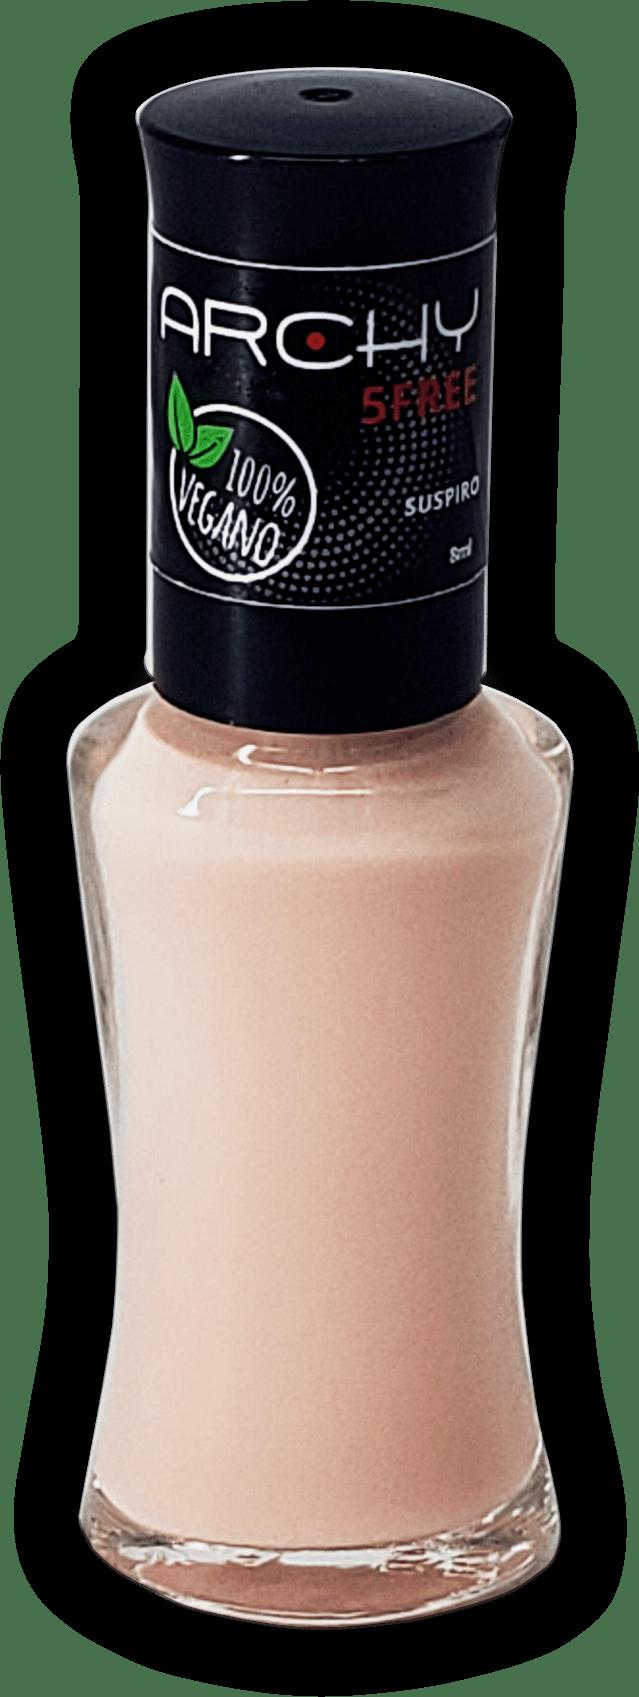 Esmalte Vegano 5 Free Suspiro - Archy Make Up